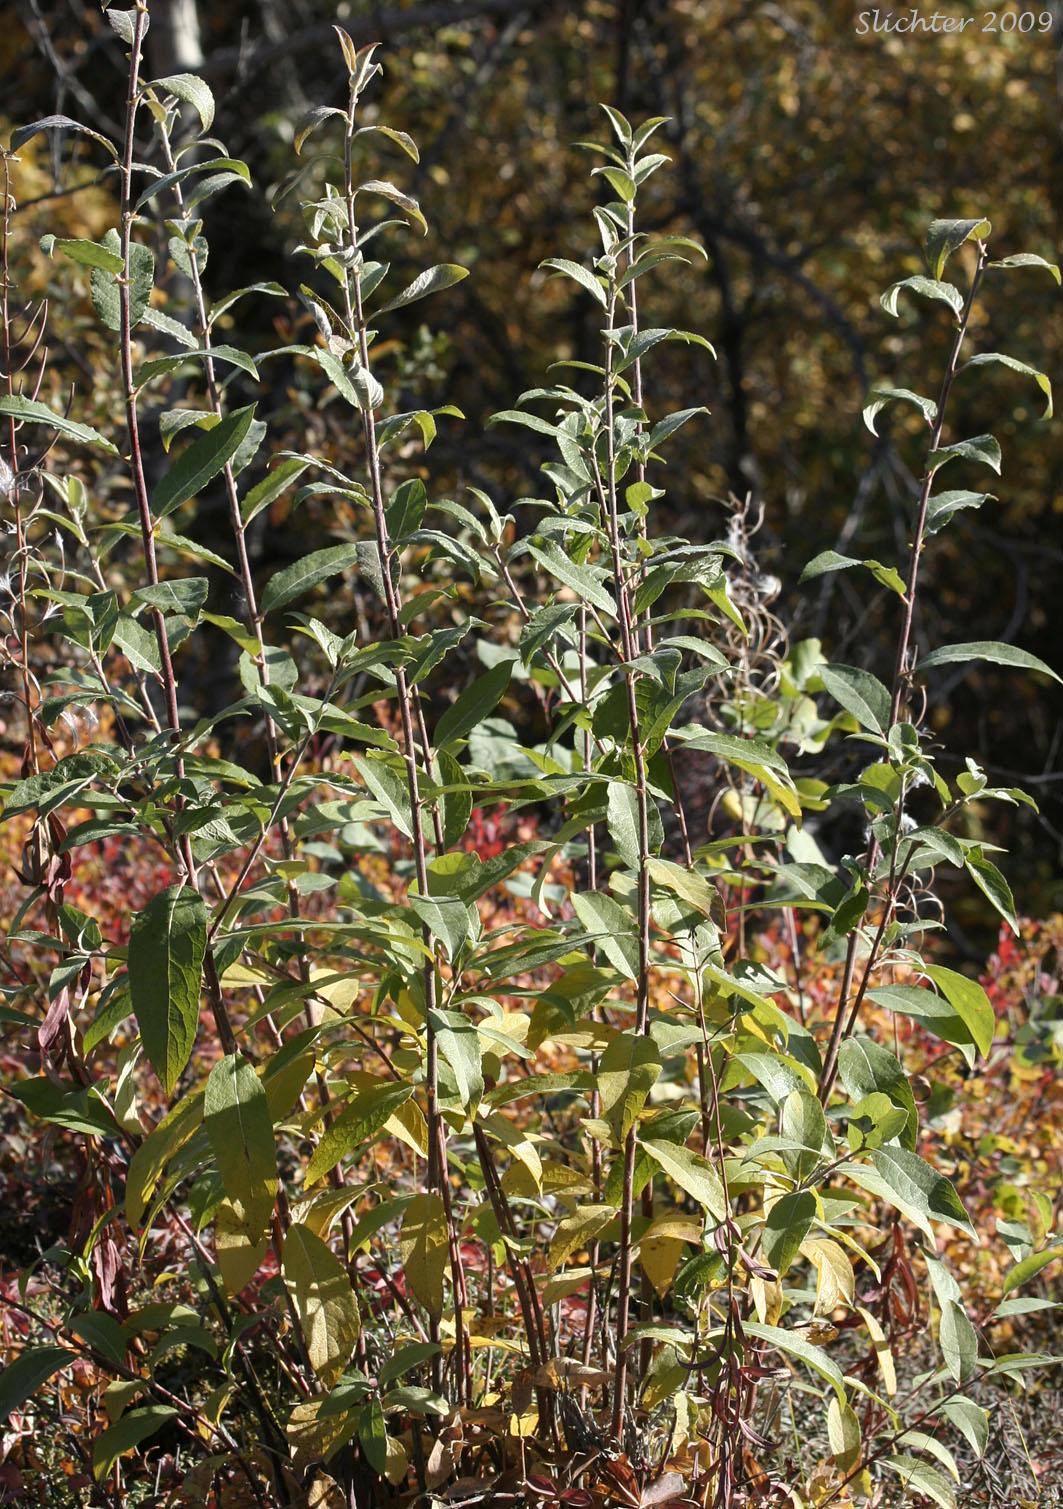 Alaska Willow Felt Leaf Willow Salix alaxensis